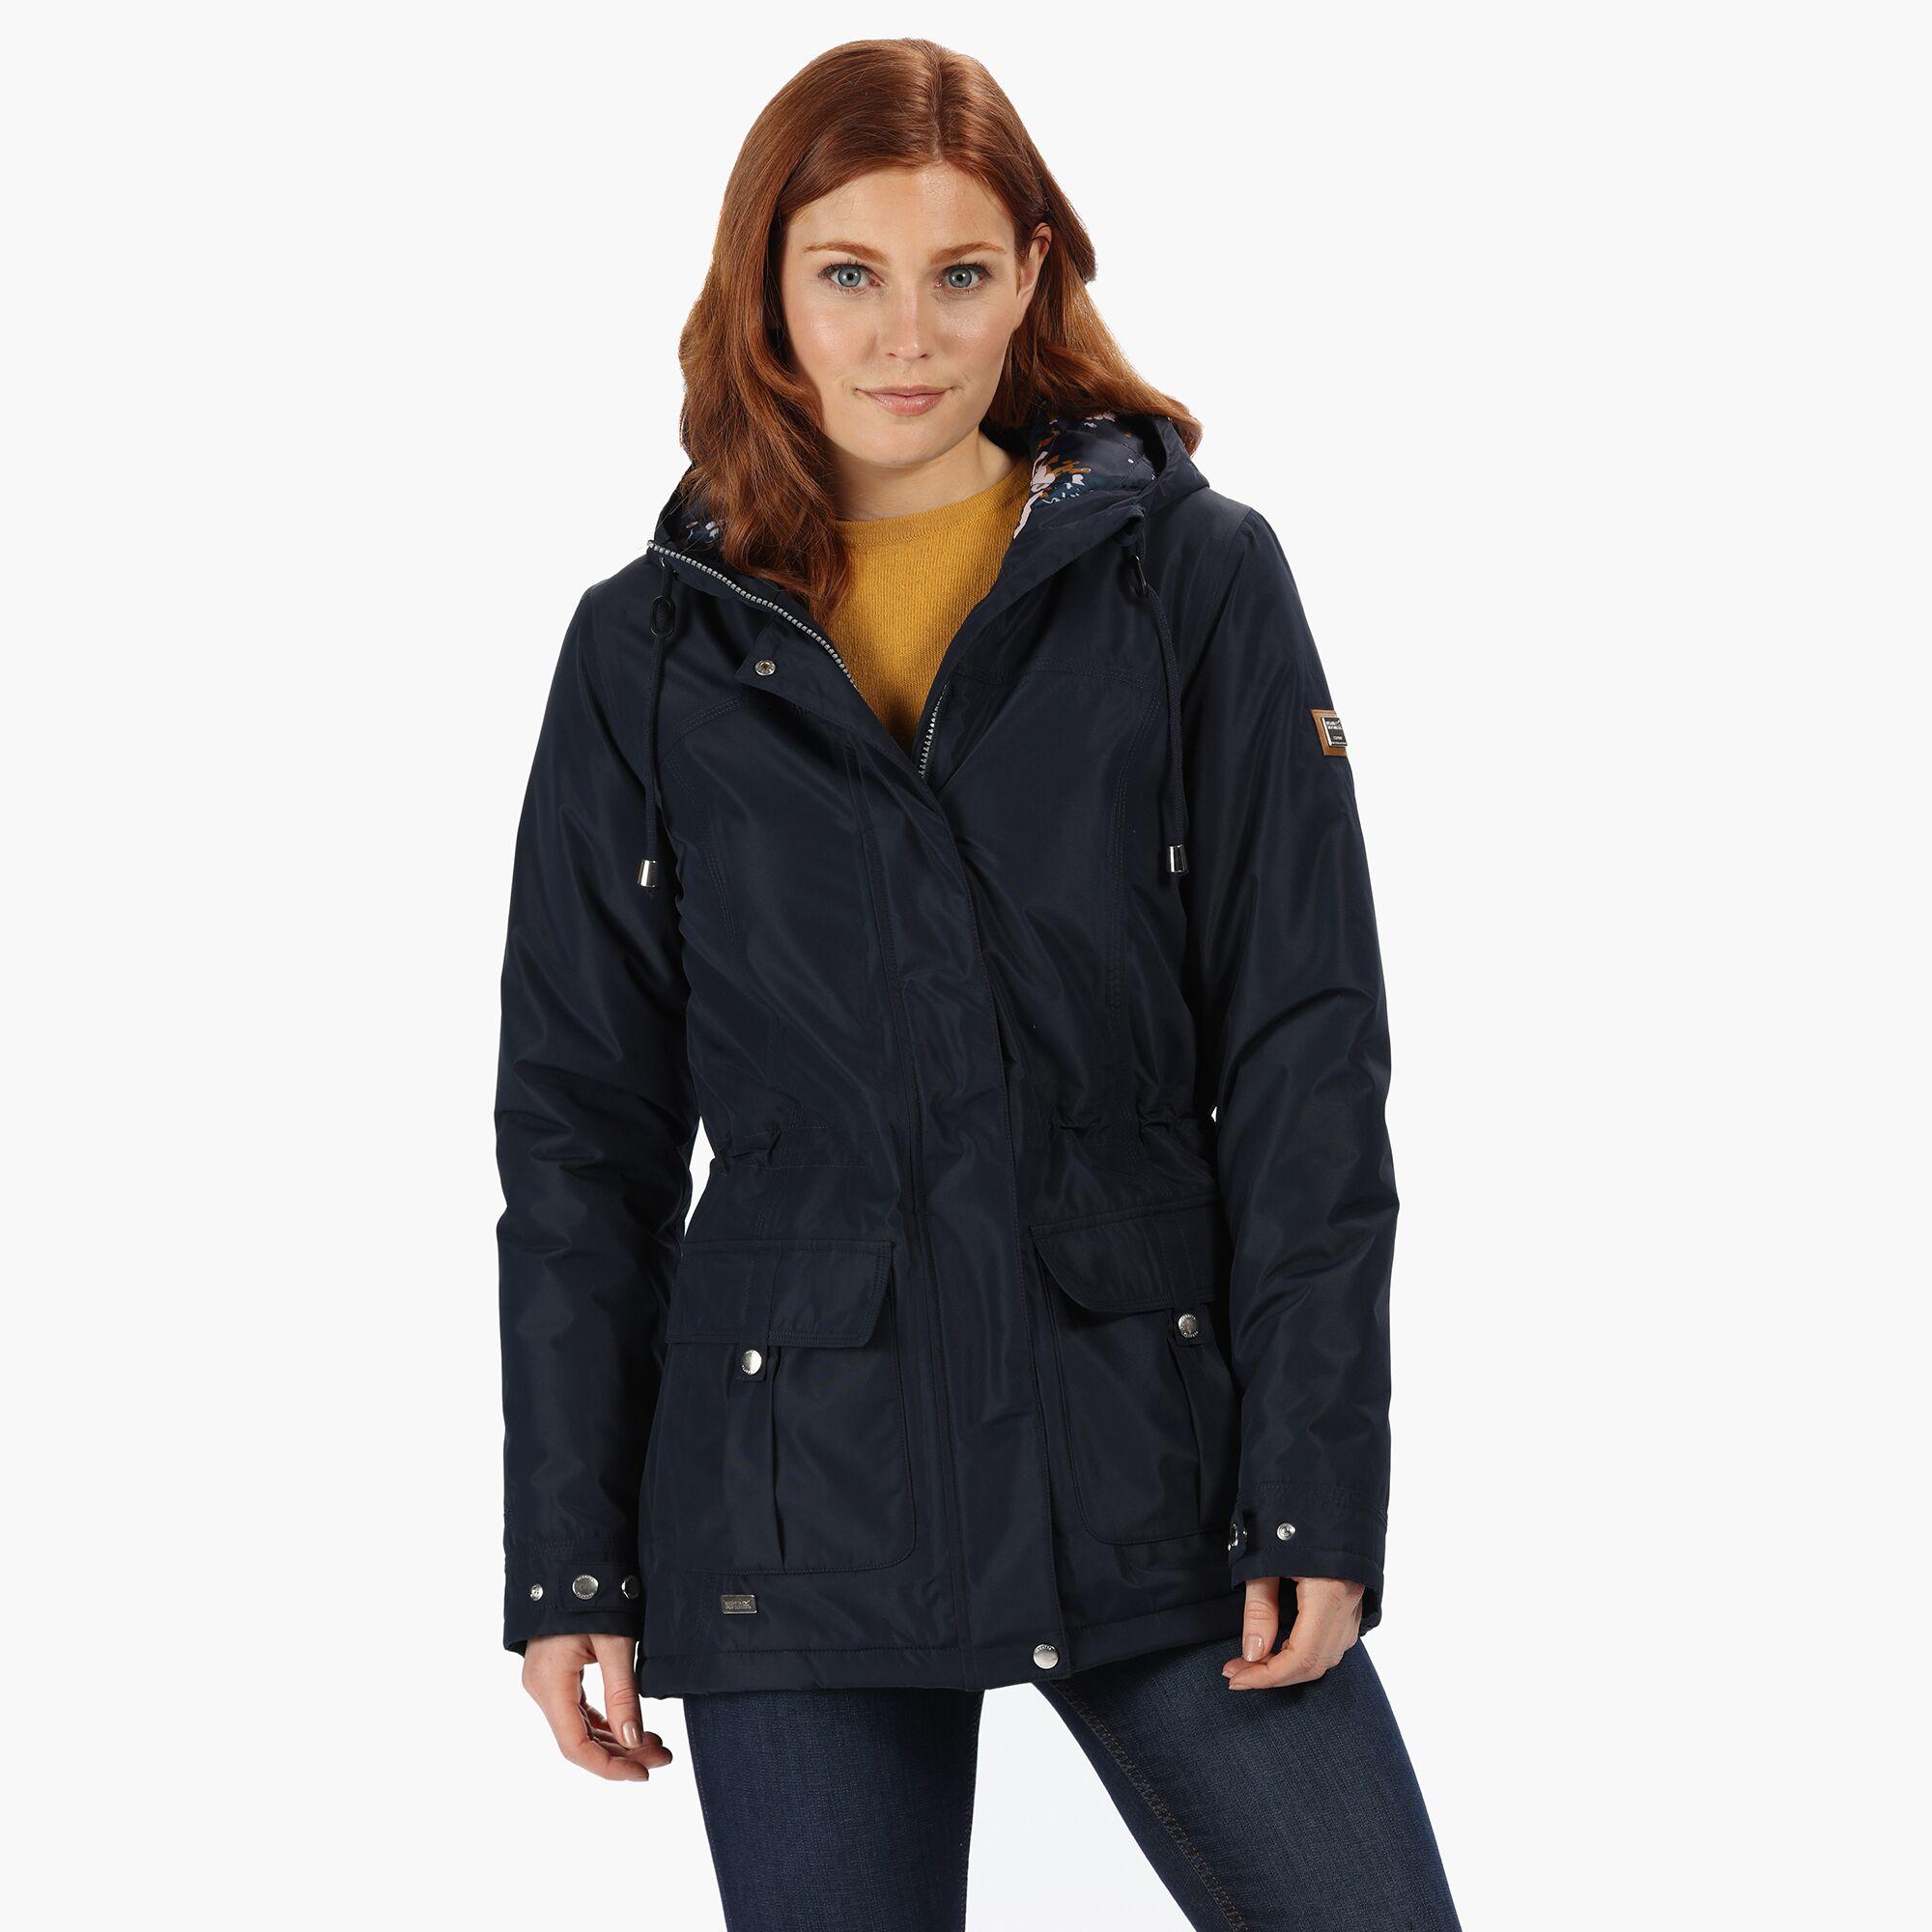 Regatta-Womens-Ladies-Braelynn-Long-Length-Waterproof-Jacket-RG4552 thumbnail 20